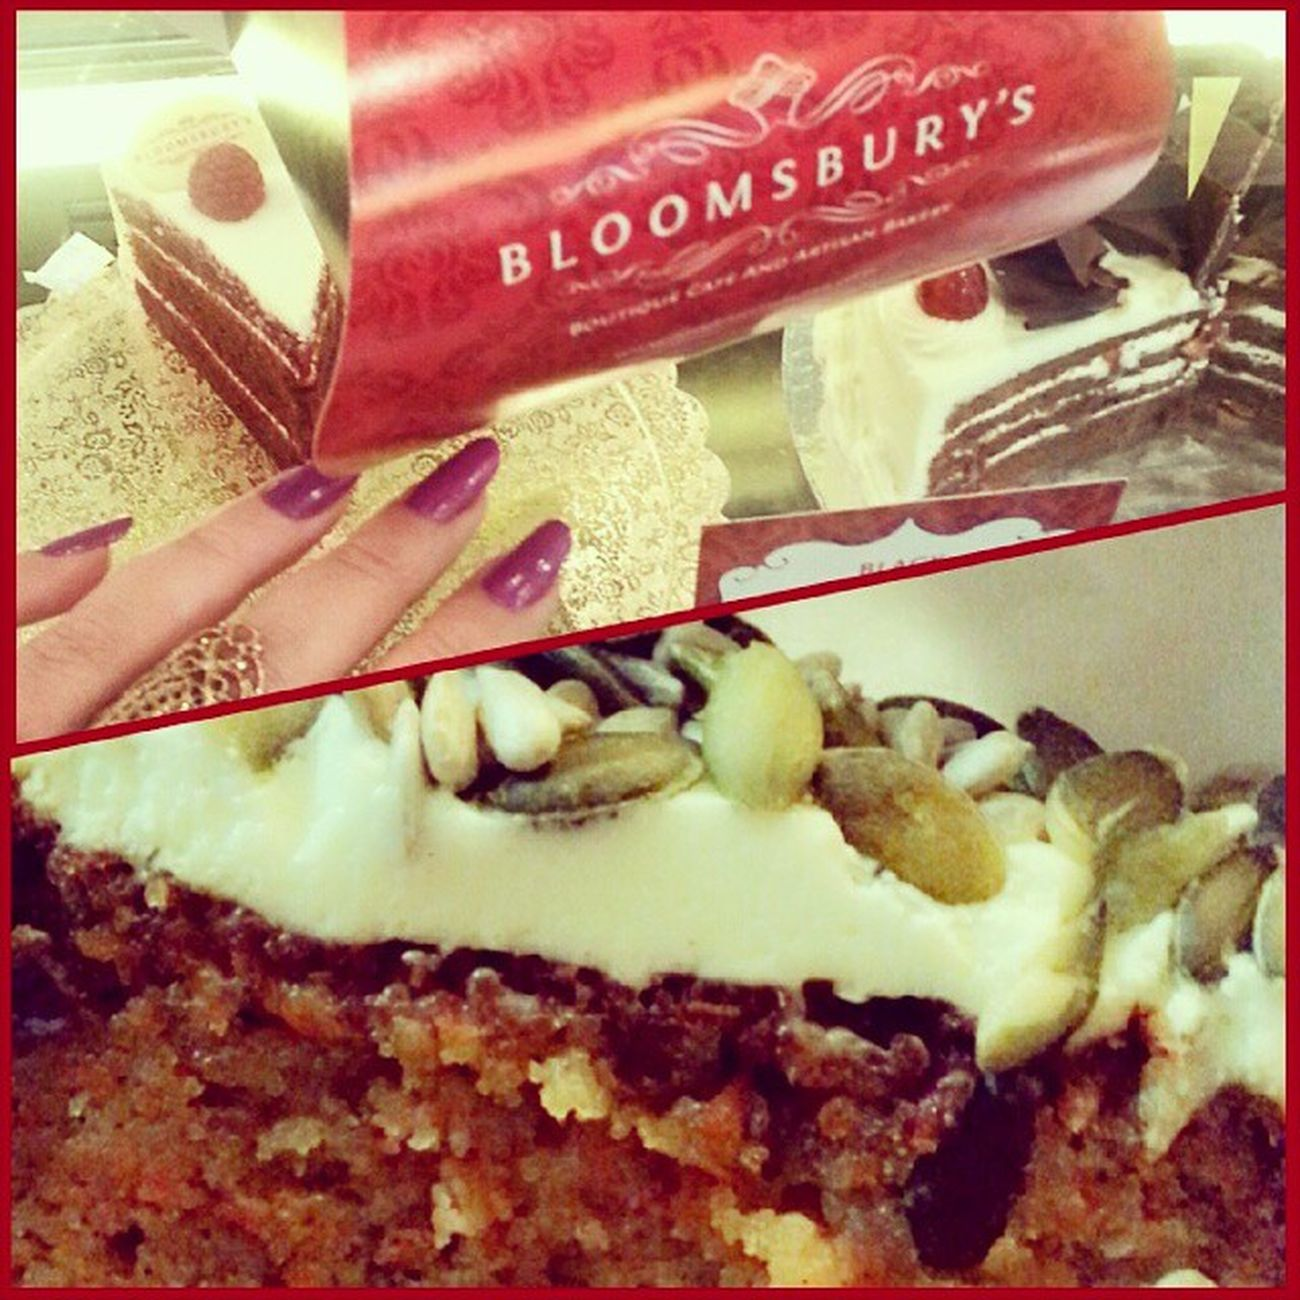 Something a little devilish for dinner.. Carrotcake Bloomsburys Alwahda Alwahdamall yummy cake abudhabi uae ♡